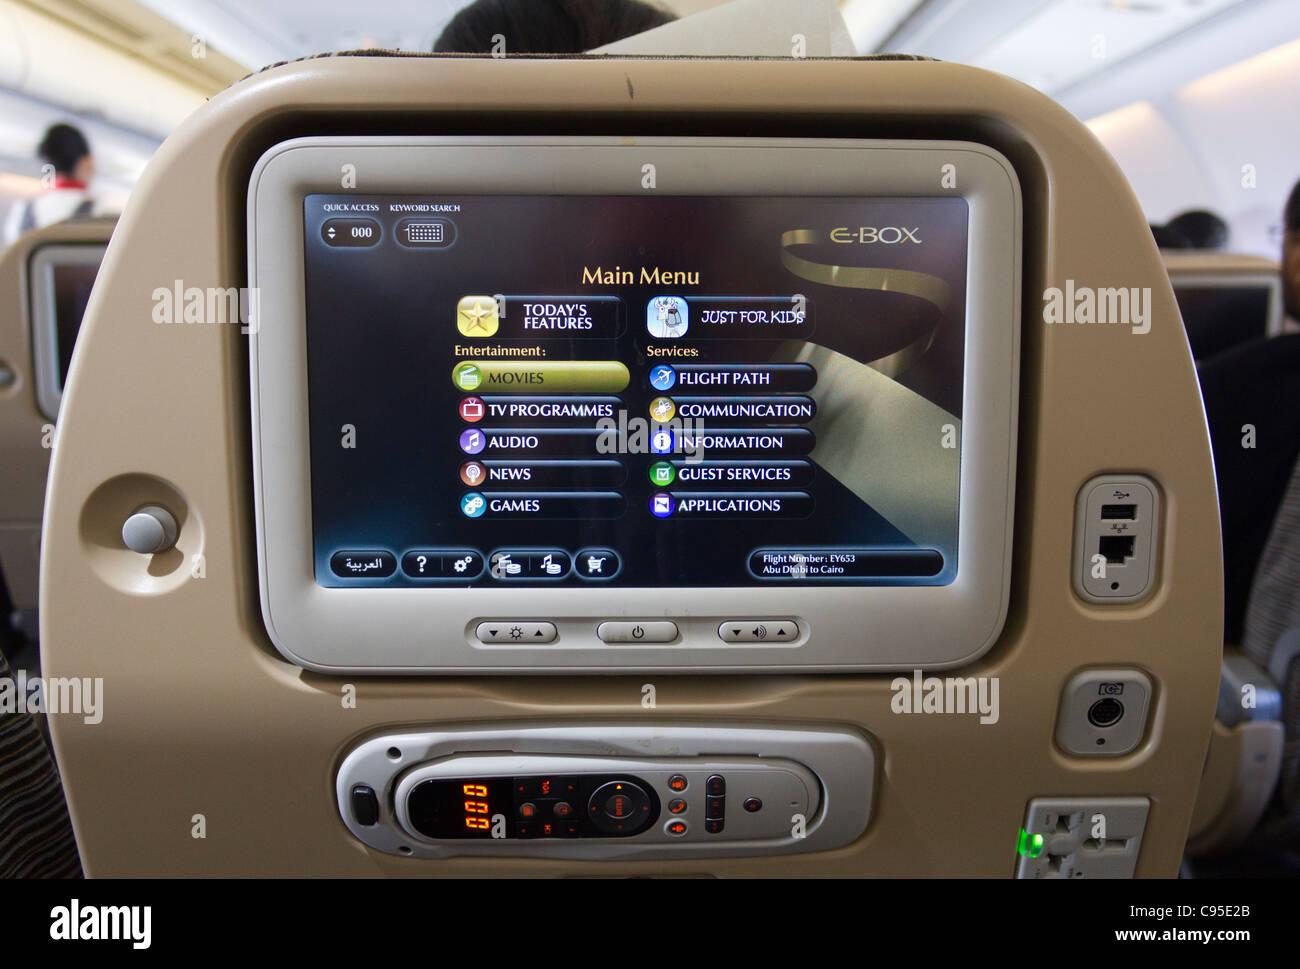 etihad airways inflight on screen entertainment menu